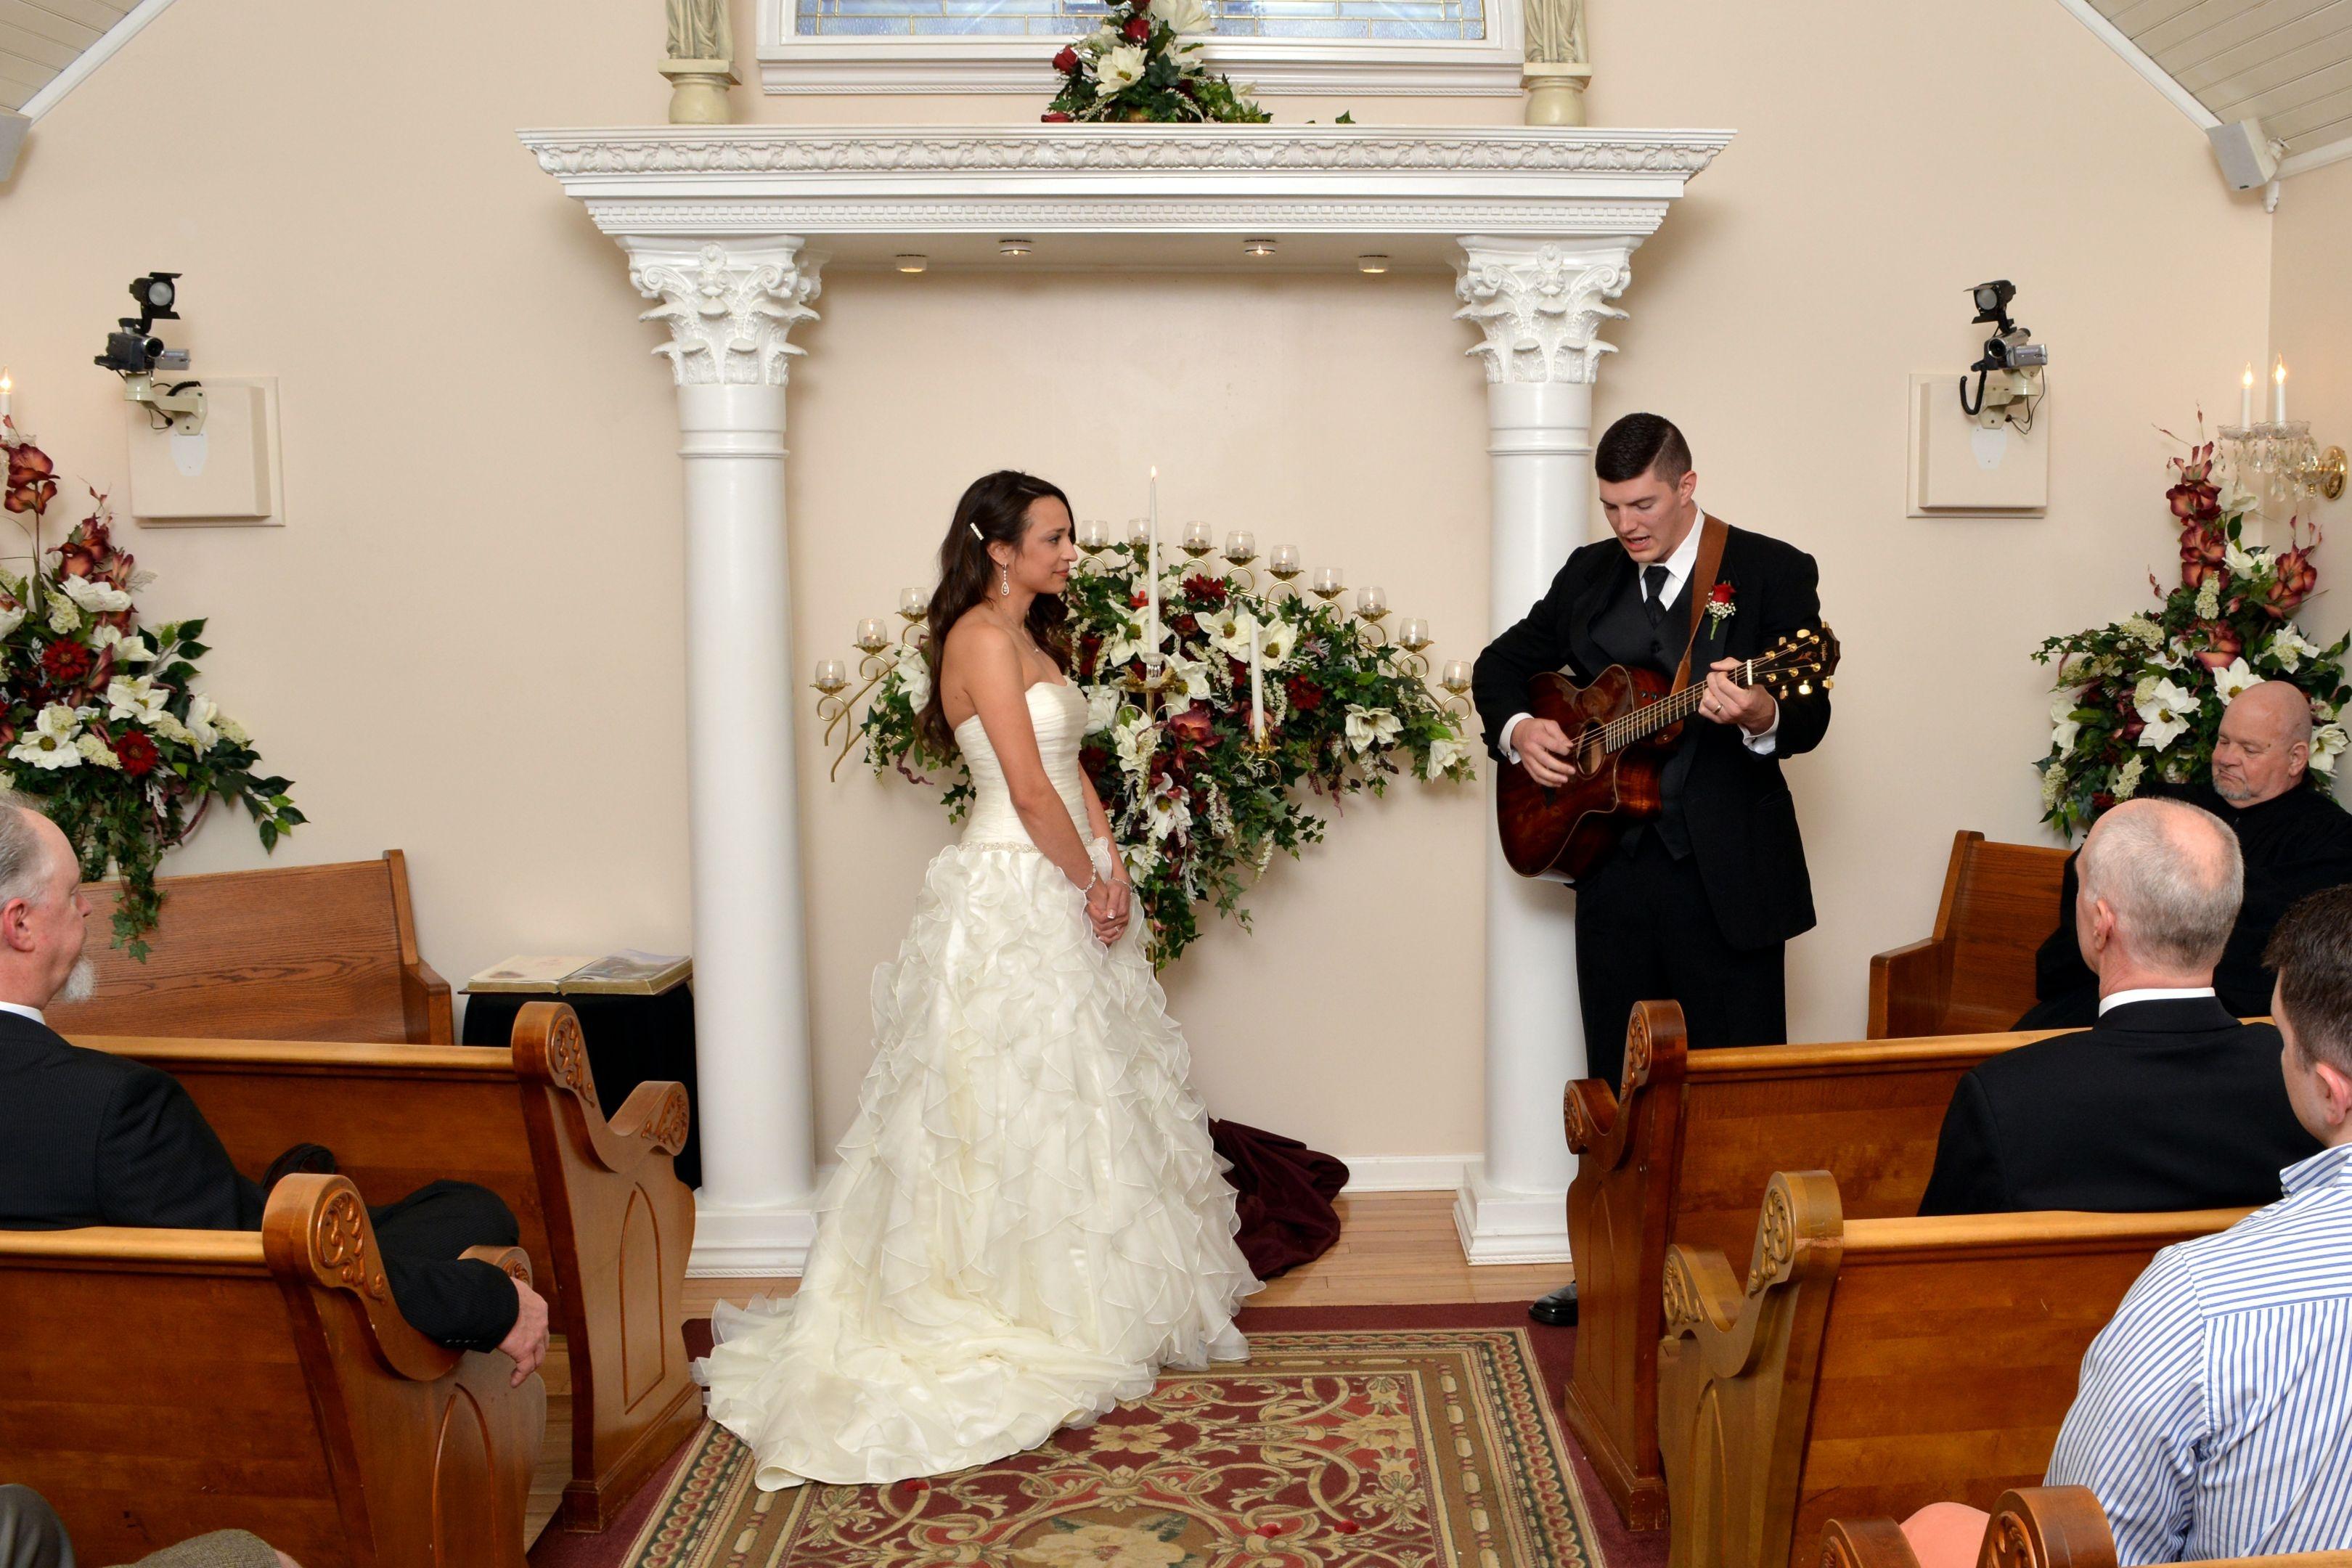 Wedding Chapel at Honeymoon Hills, Gatlinburg Wedding Chapel image 2